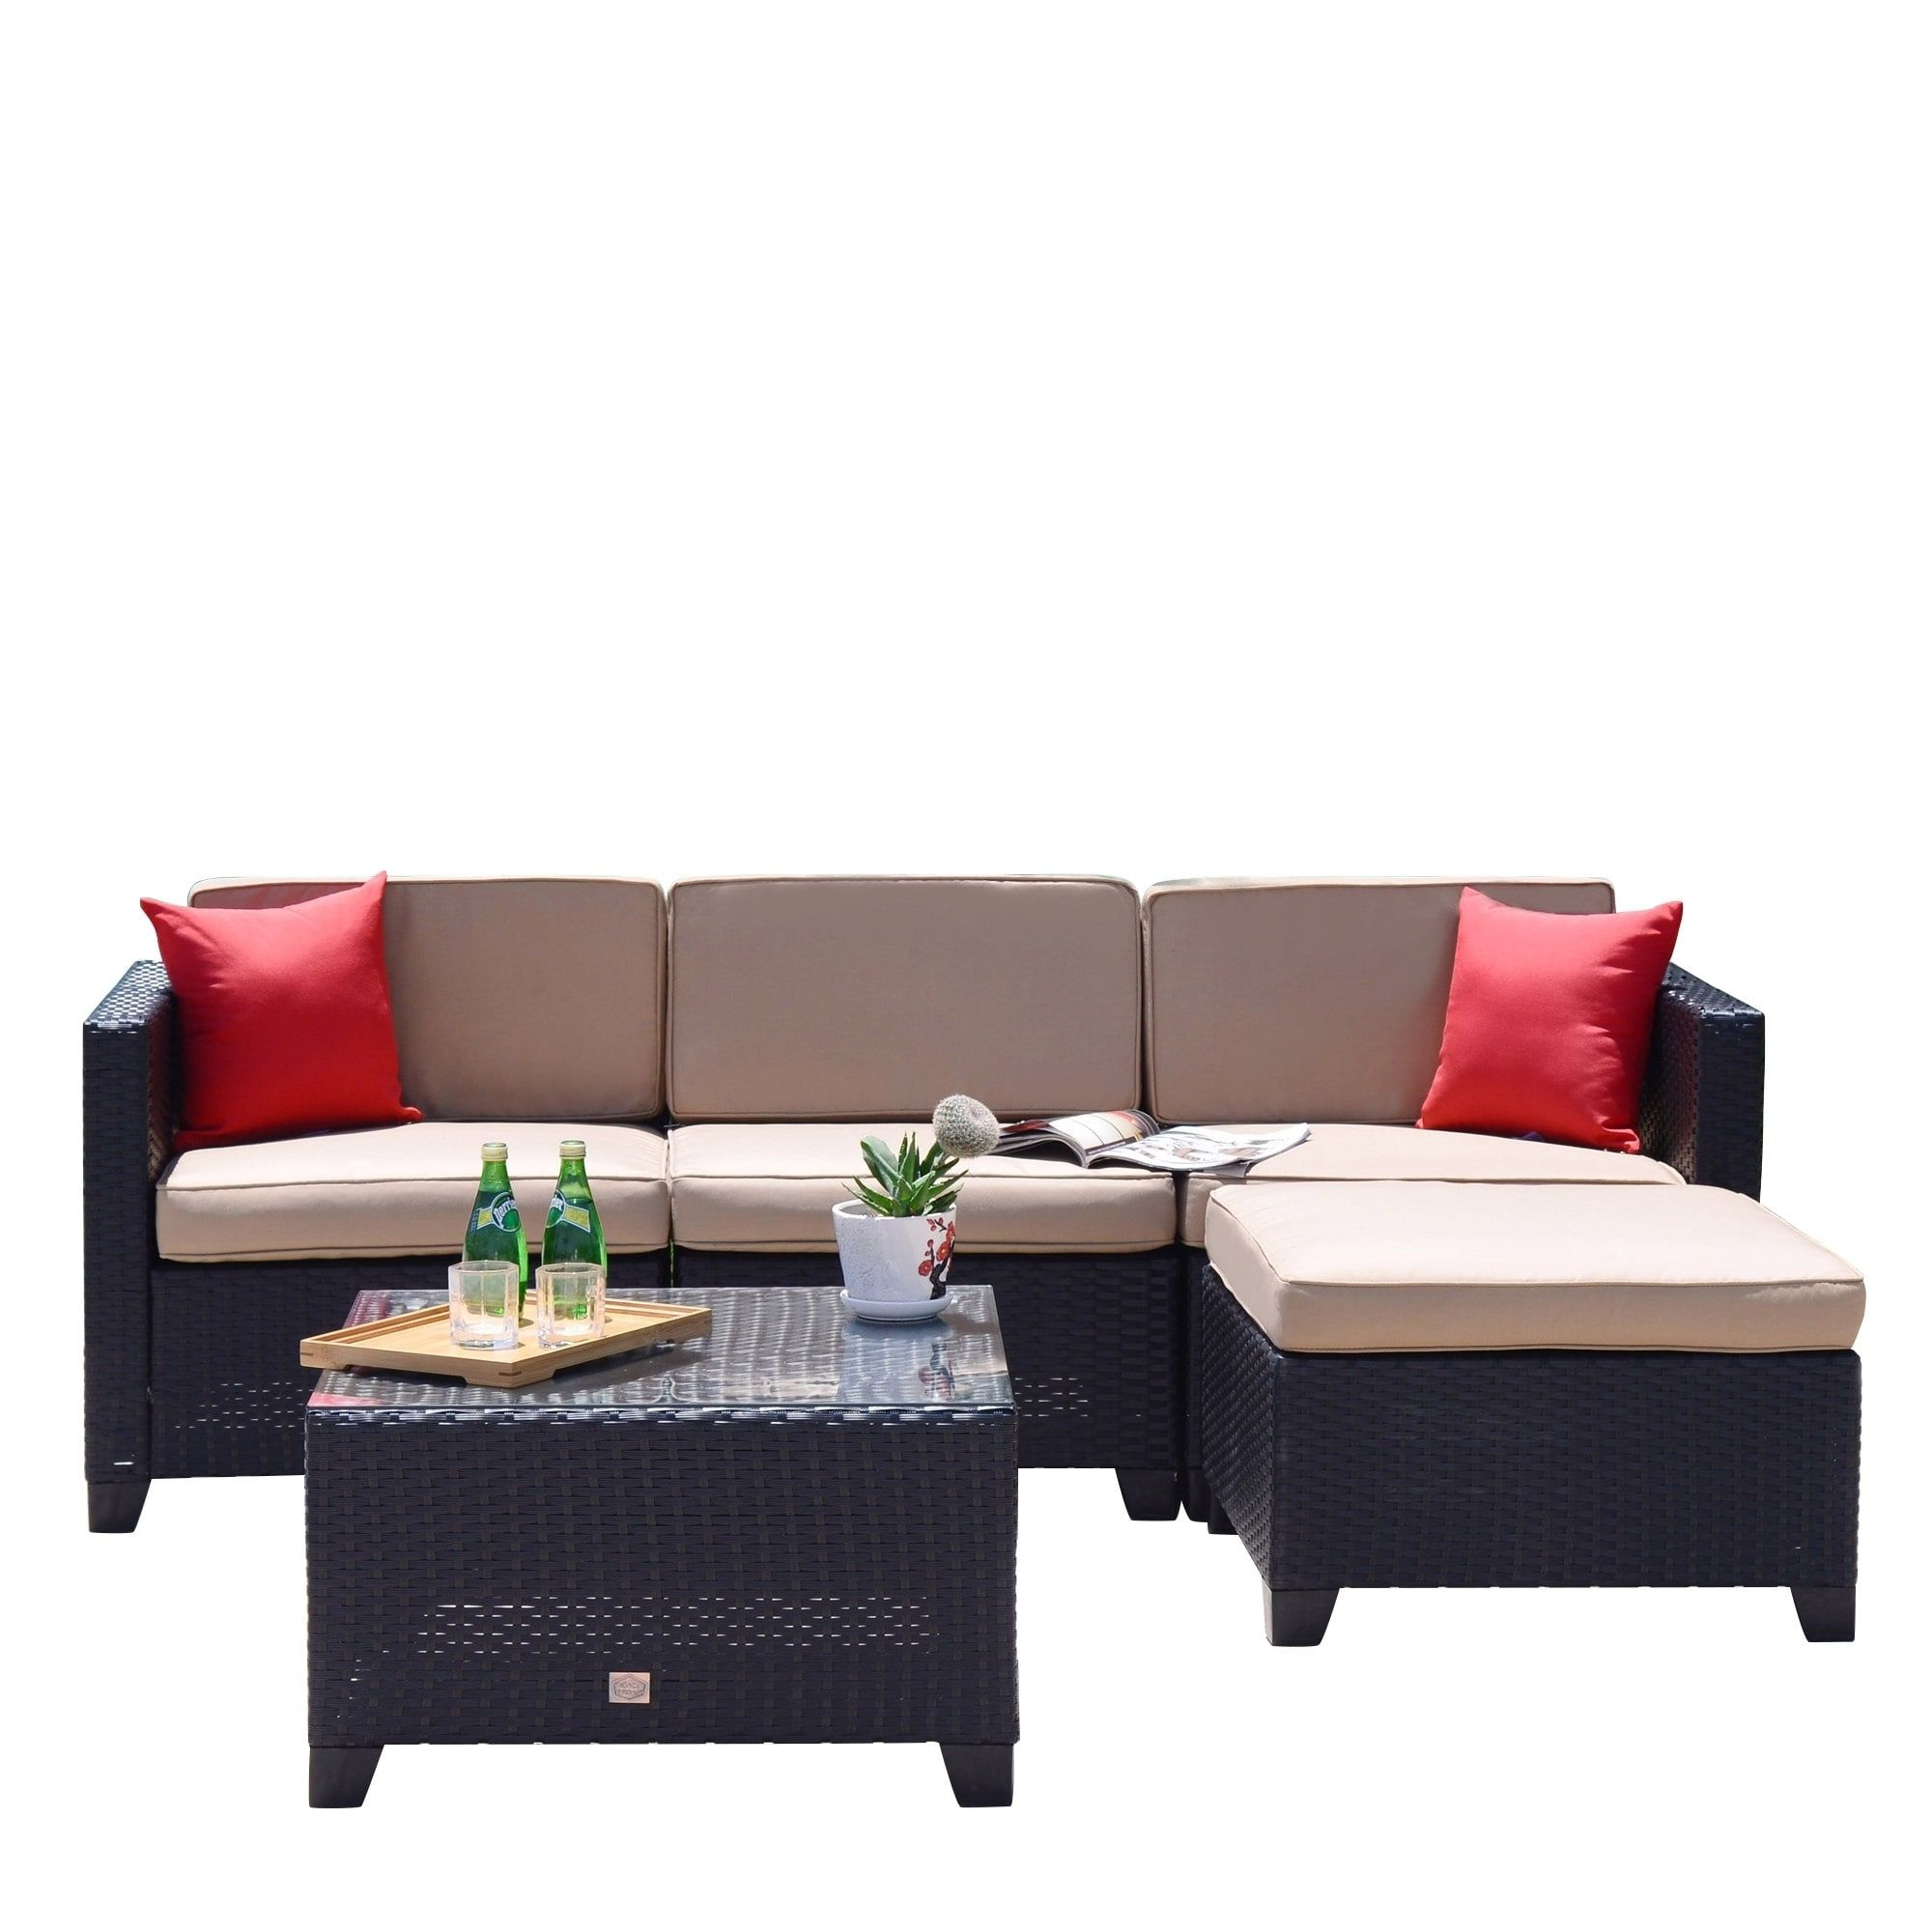 Astounding 5 Pc Rattan Sofa Set Cushioned Sectional Outdoor Garden Creativecarmelina Interior Chair Design Creativecarmelinacom